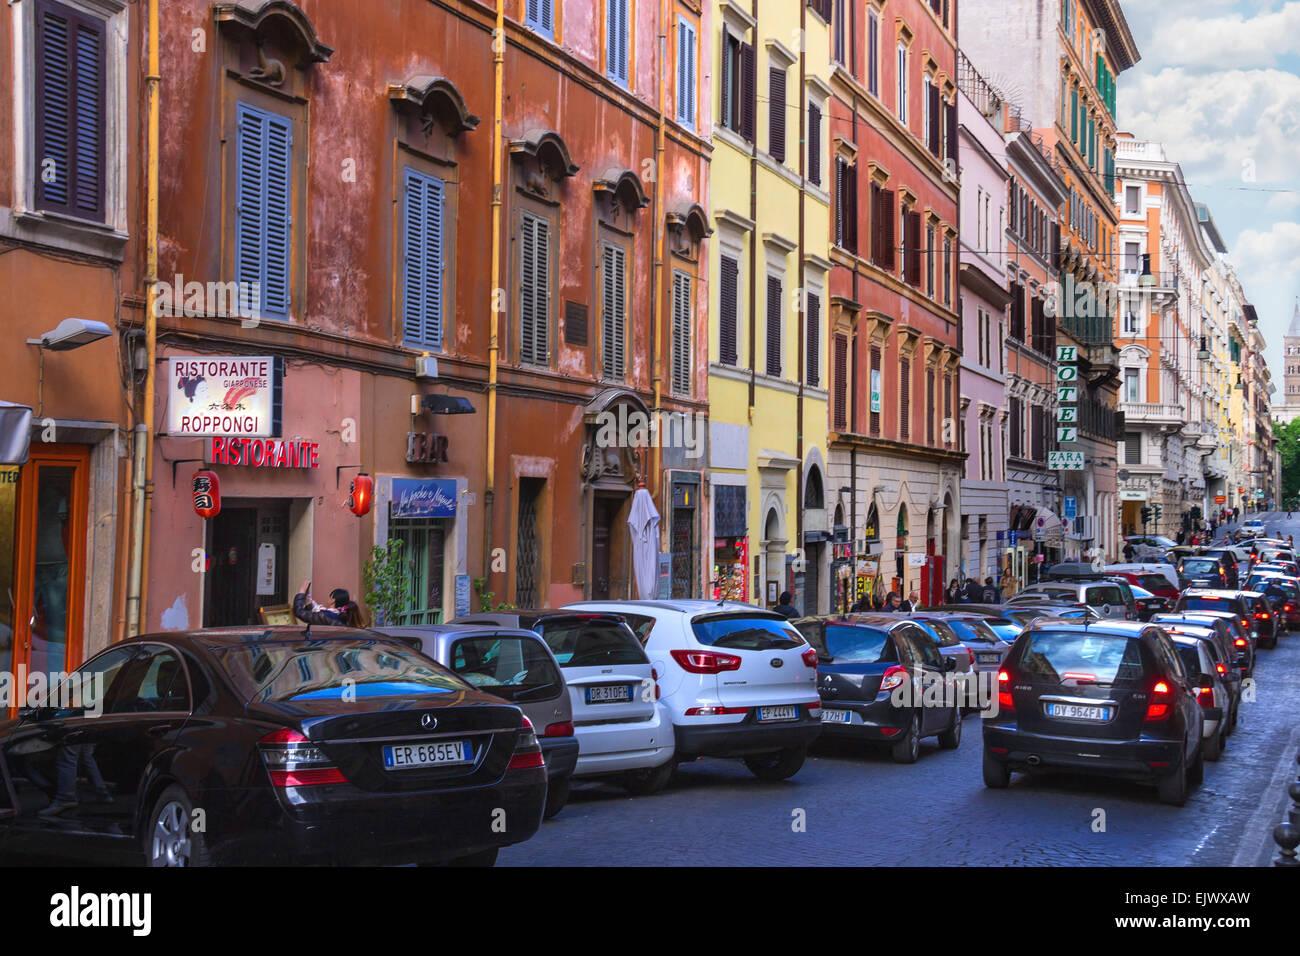 ROME, ITALY - MAY 04, 2014: Cars on the street Via Quattro Fontane in Rome, Italy Stock Photo